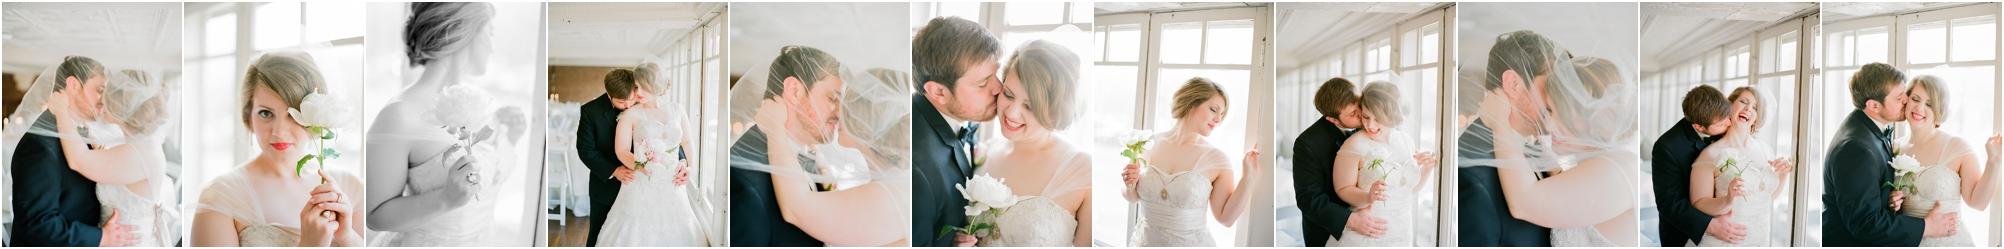 Kansas City Wedding Photographer - Jordan Brittley Photography